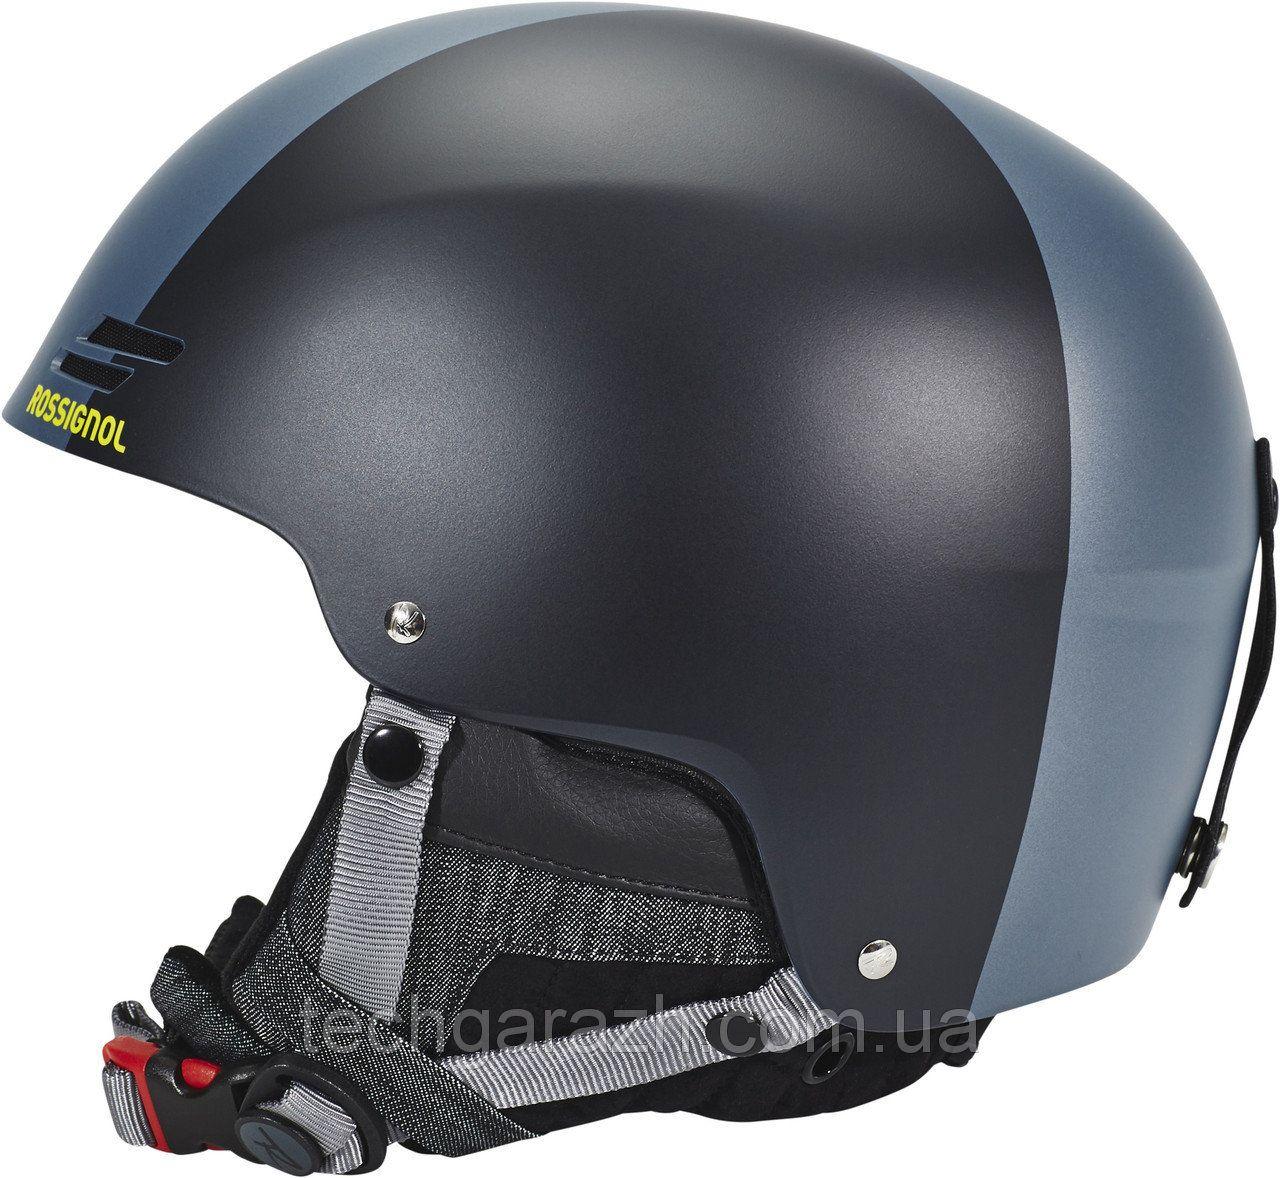 Шолом гірськолижний Rossignol Spark Mips 5962 BlackGrey